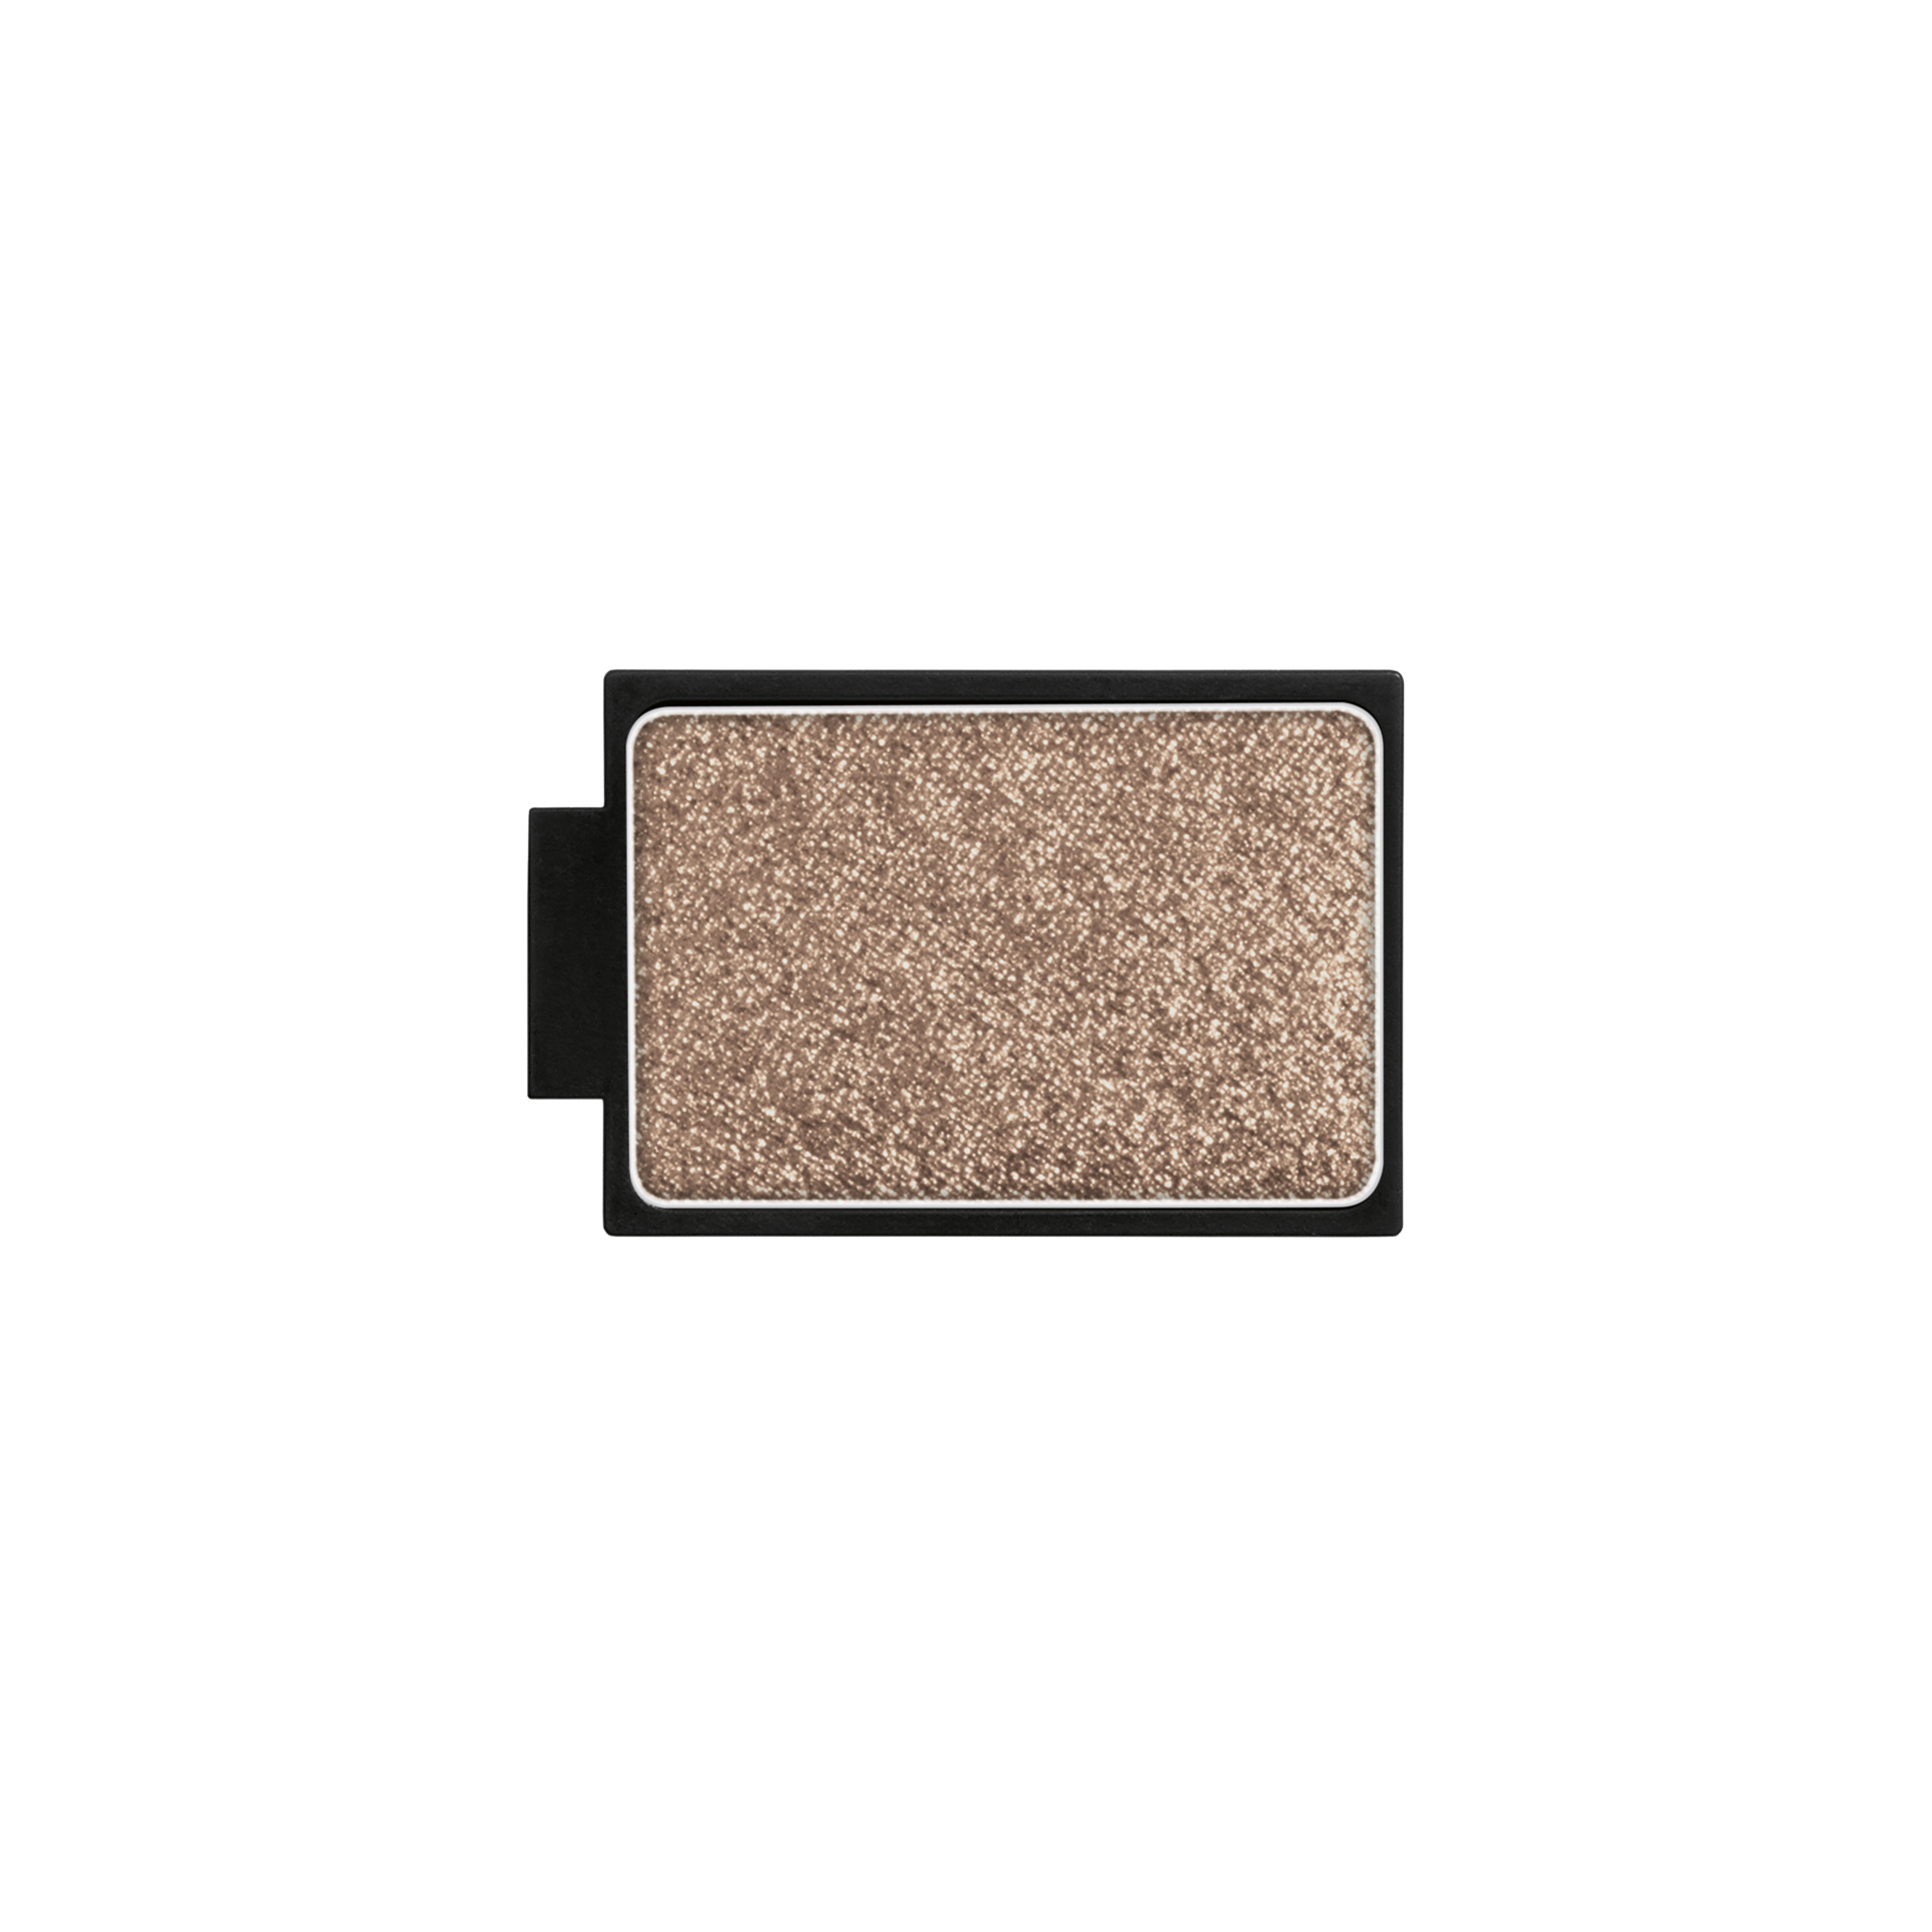 Single Bar Shade Mink Magnet (Metallic bronze)